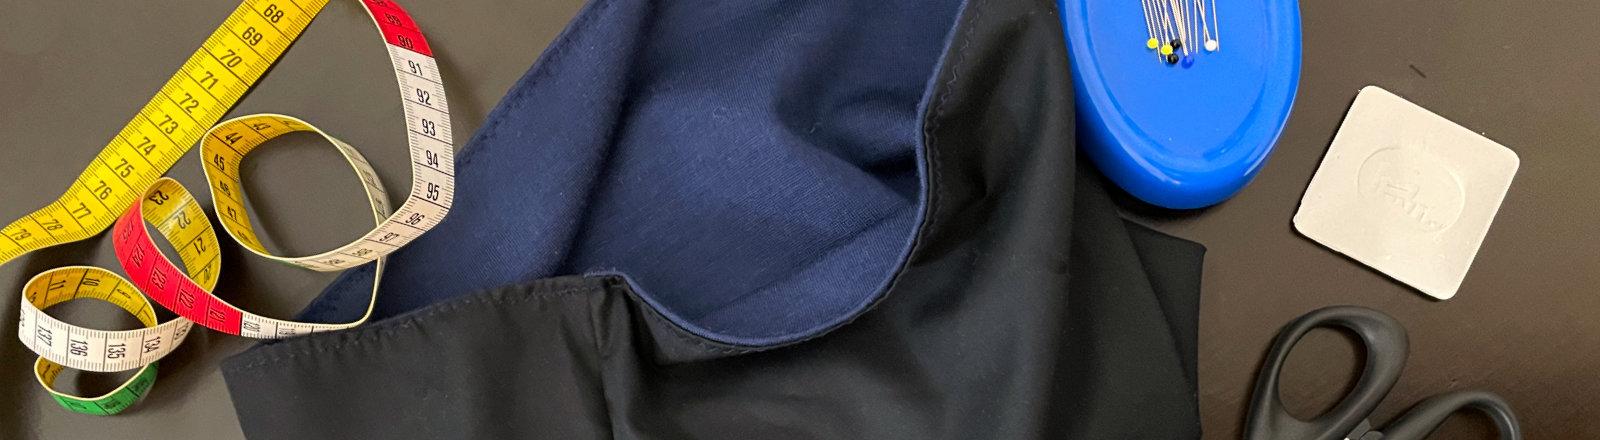 Netzbasteln: Einen Loop-Schal nähen